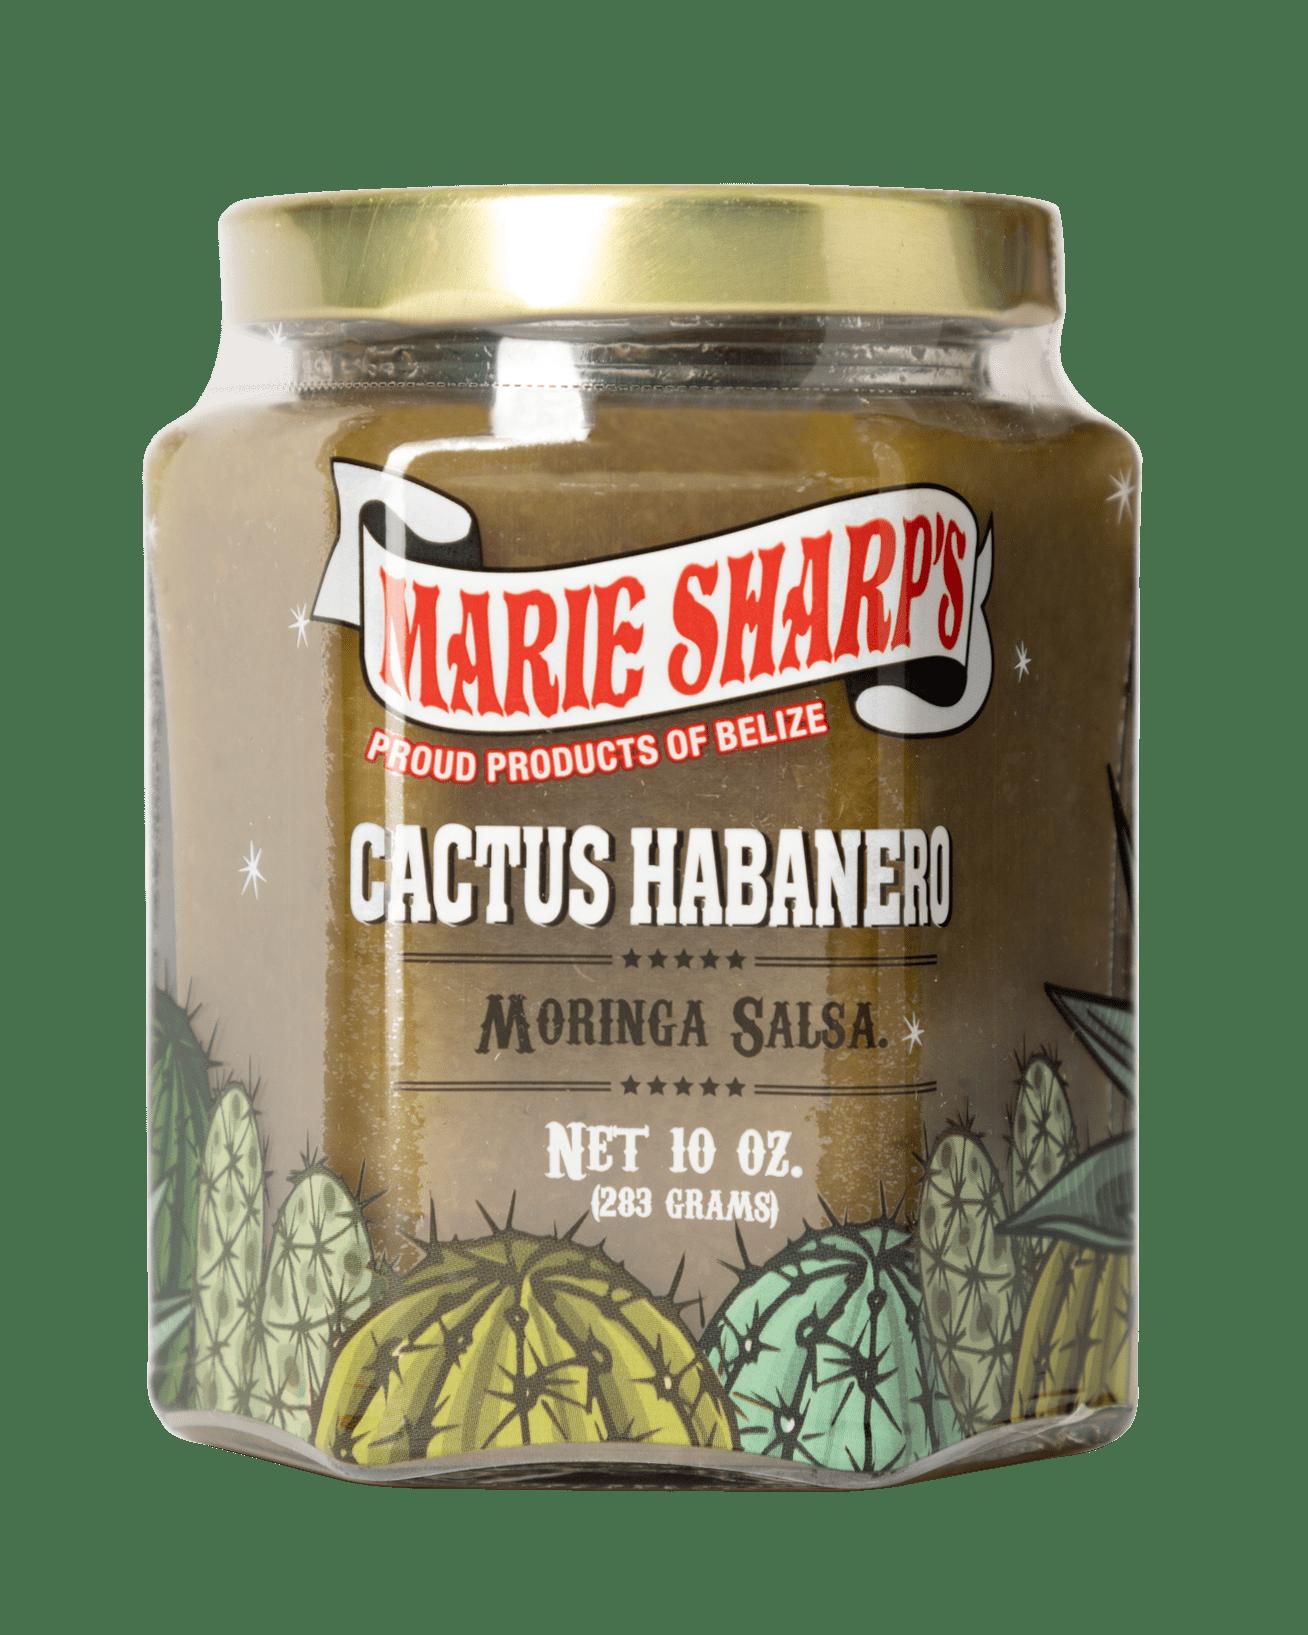 Marie Sharp's Cactus Habanero Moringa Salsa